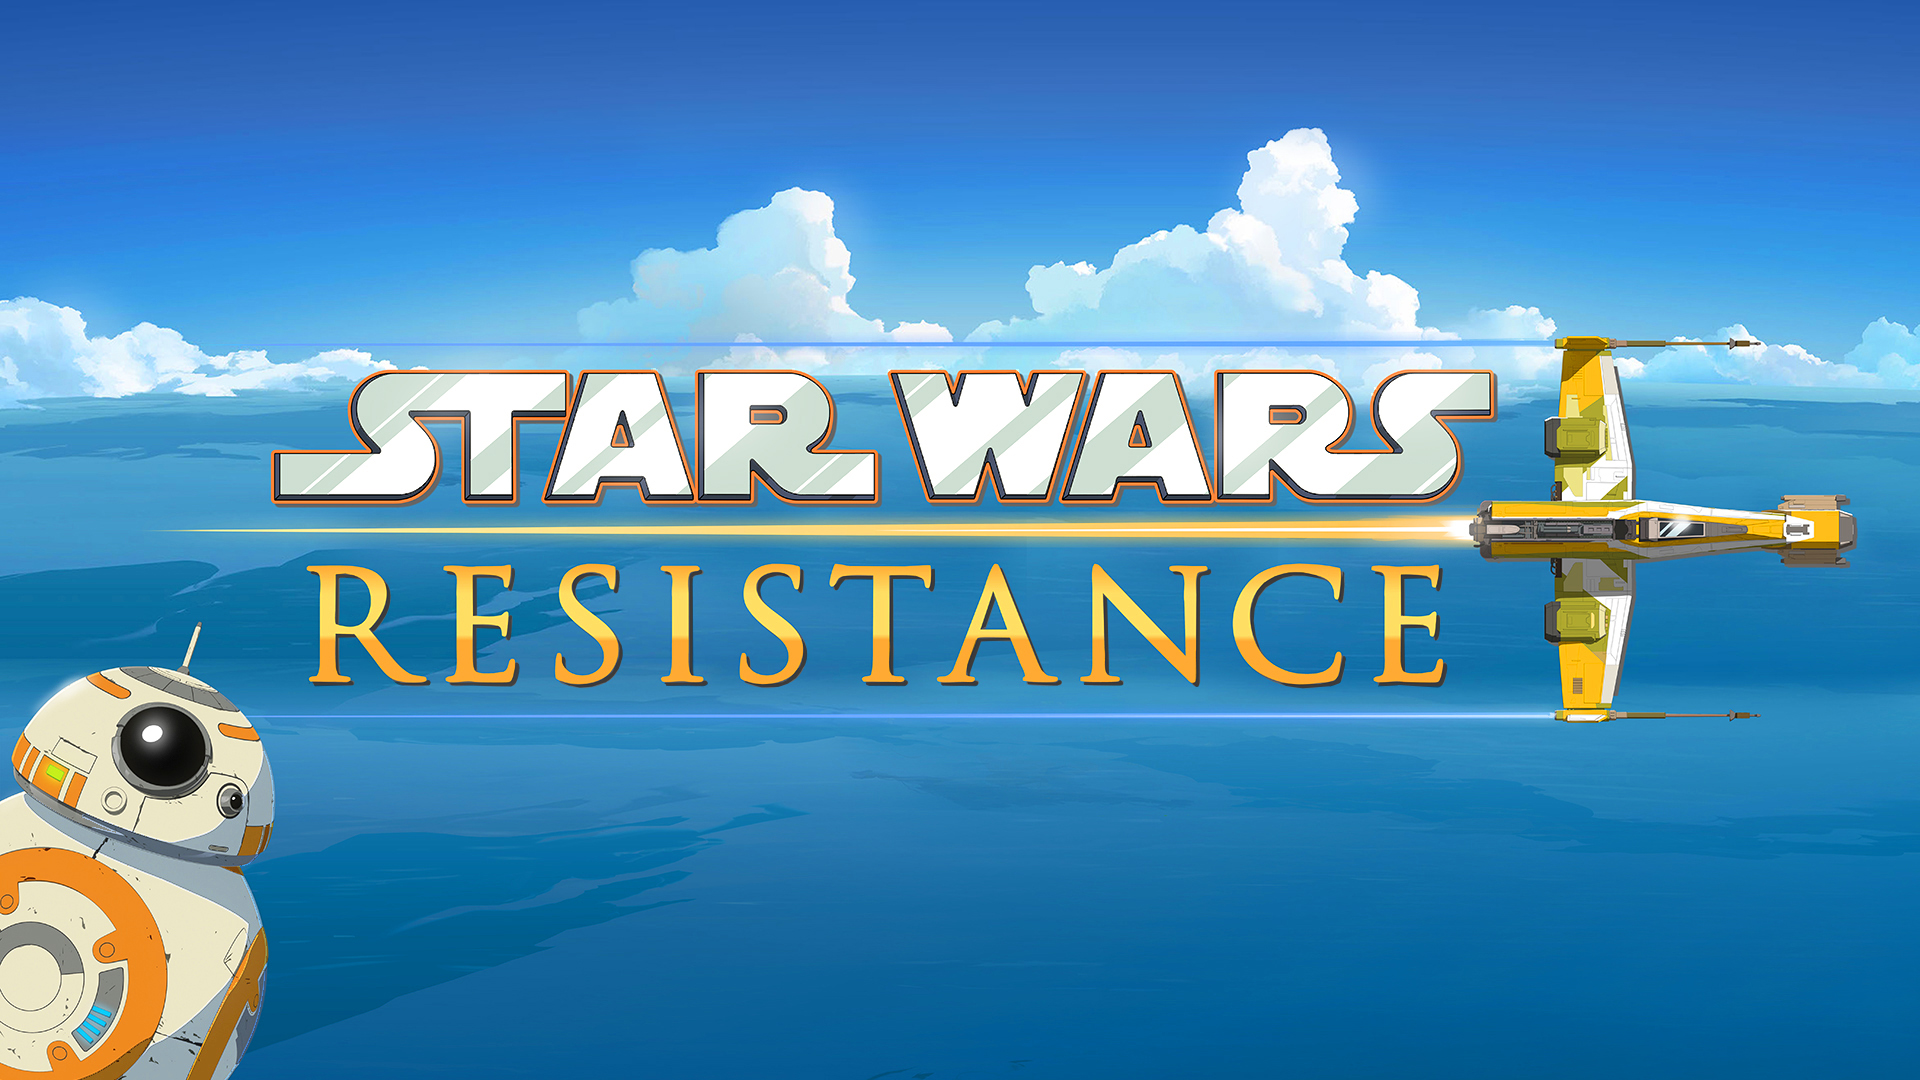 legenda do filme war of resistance